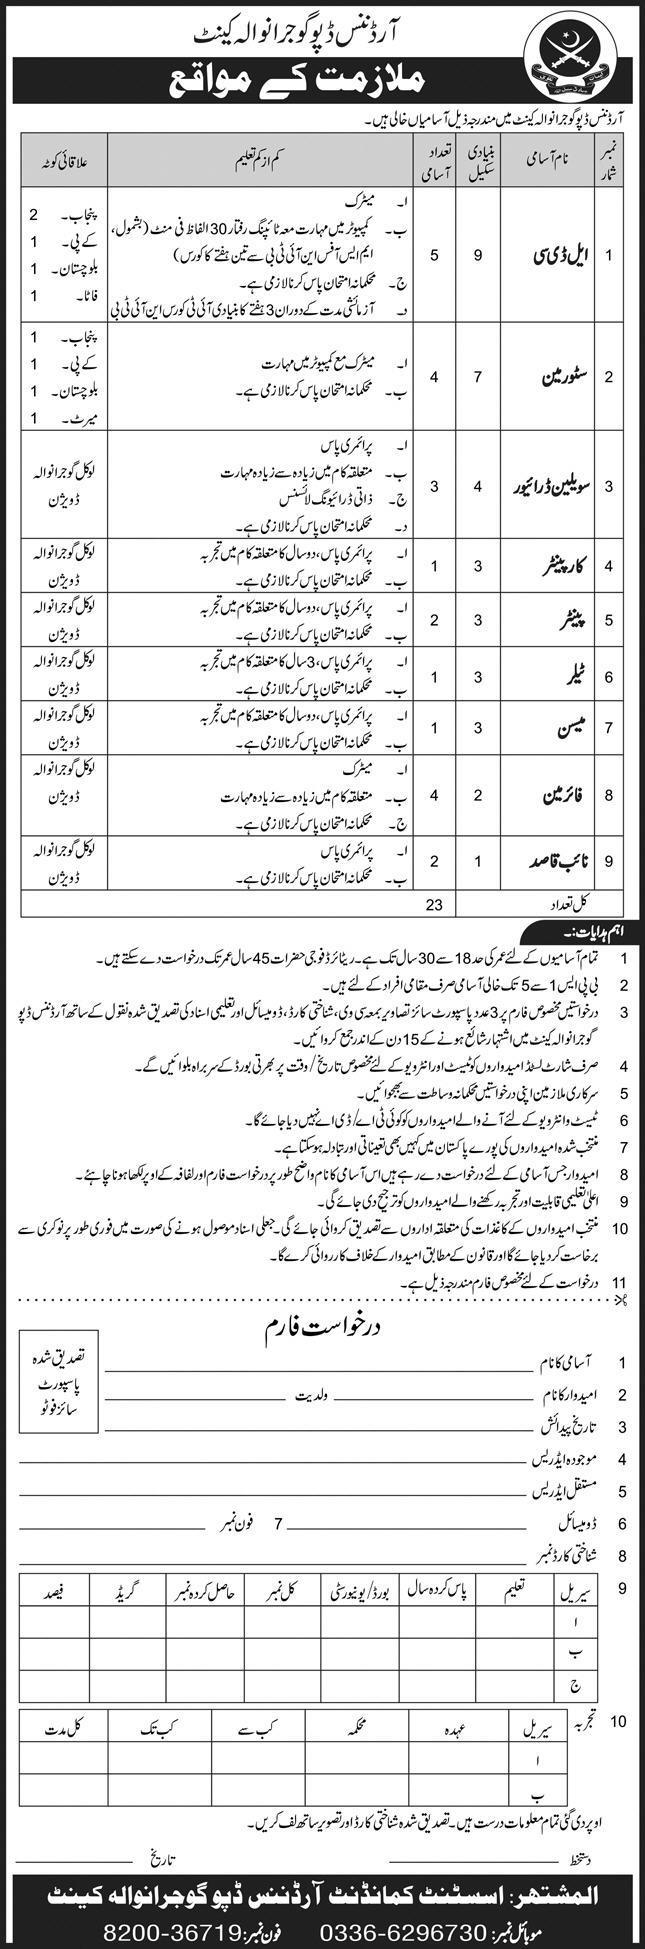 Pak Army Ordnance Depot Gujranwala Cantt Jobs 2020 in Pakistan 2020 - Download Job Application Form